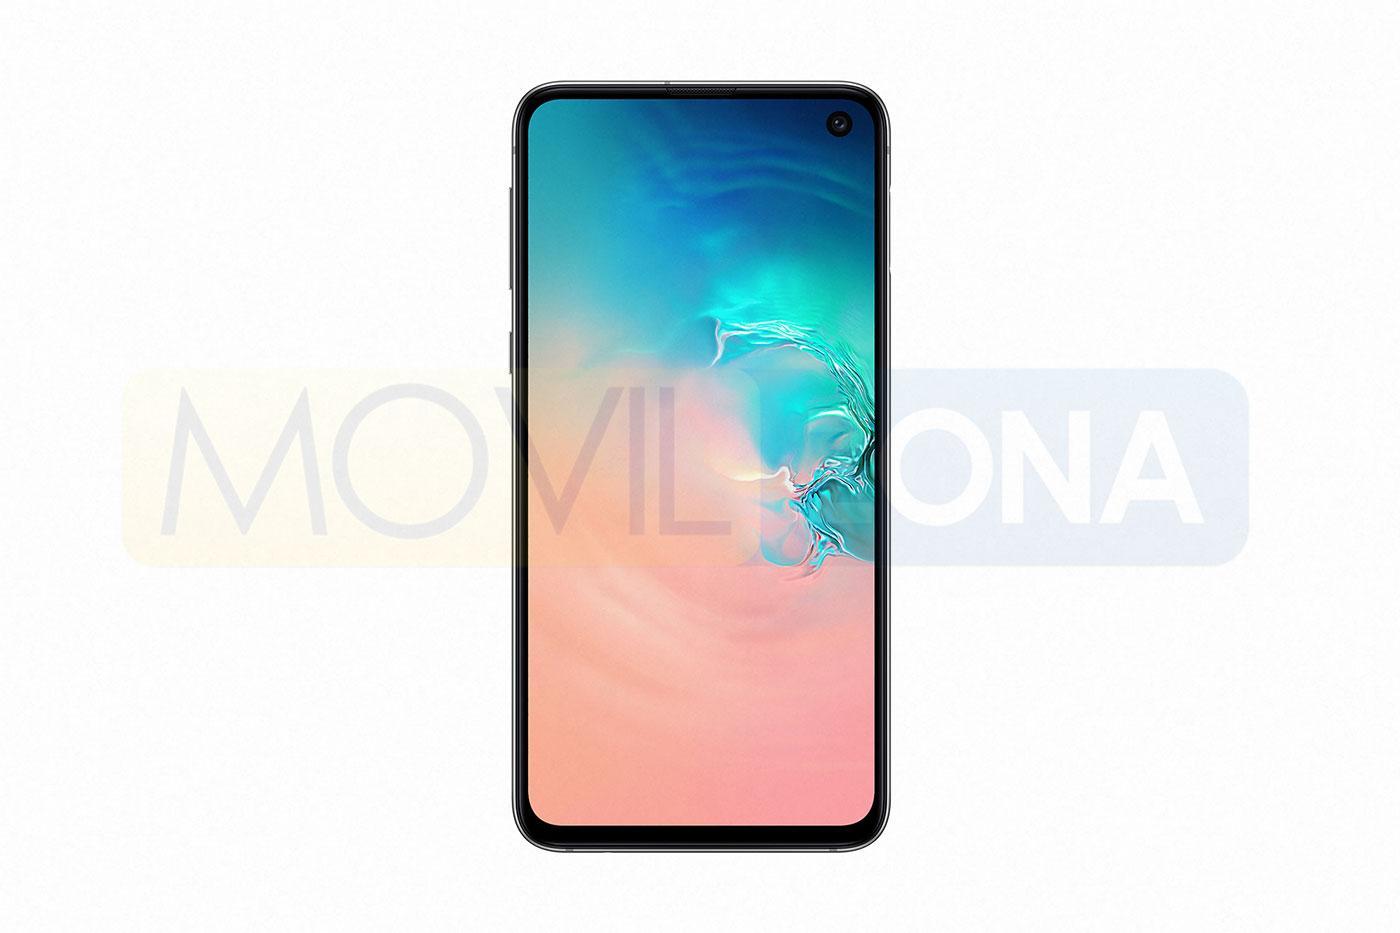 Samsung Galaxy S10e frontal color